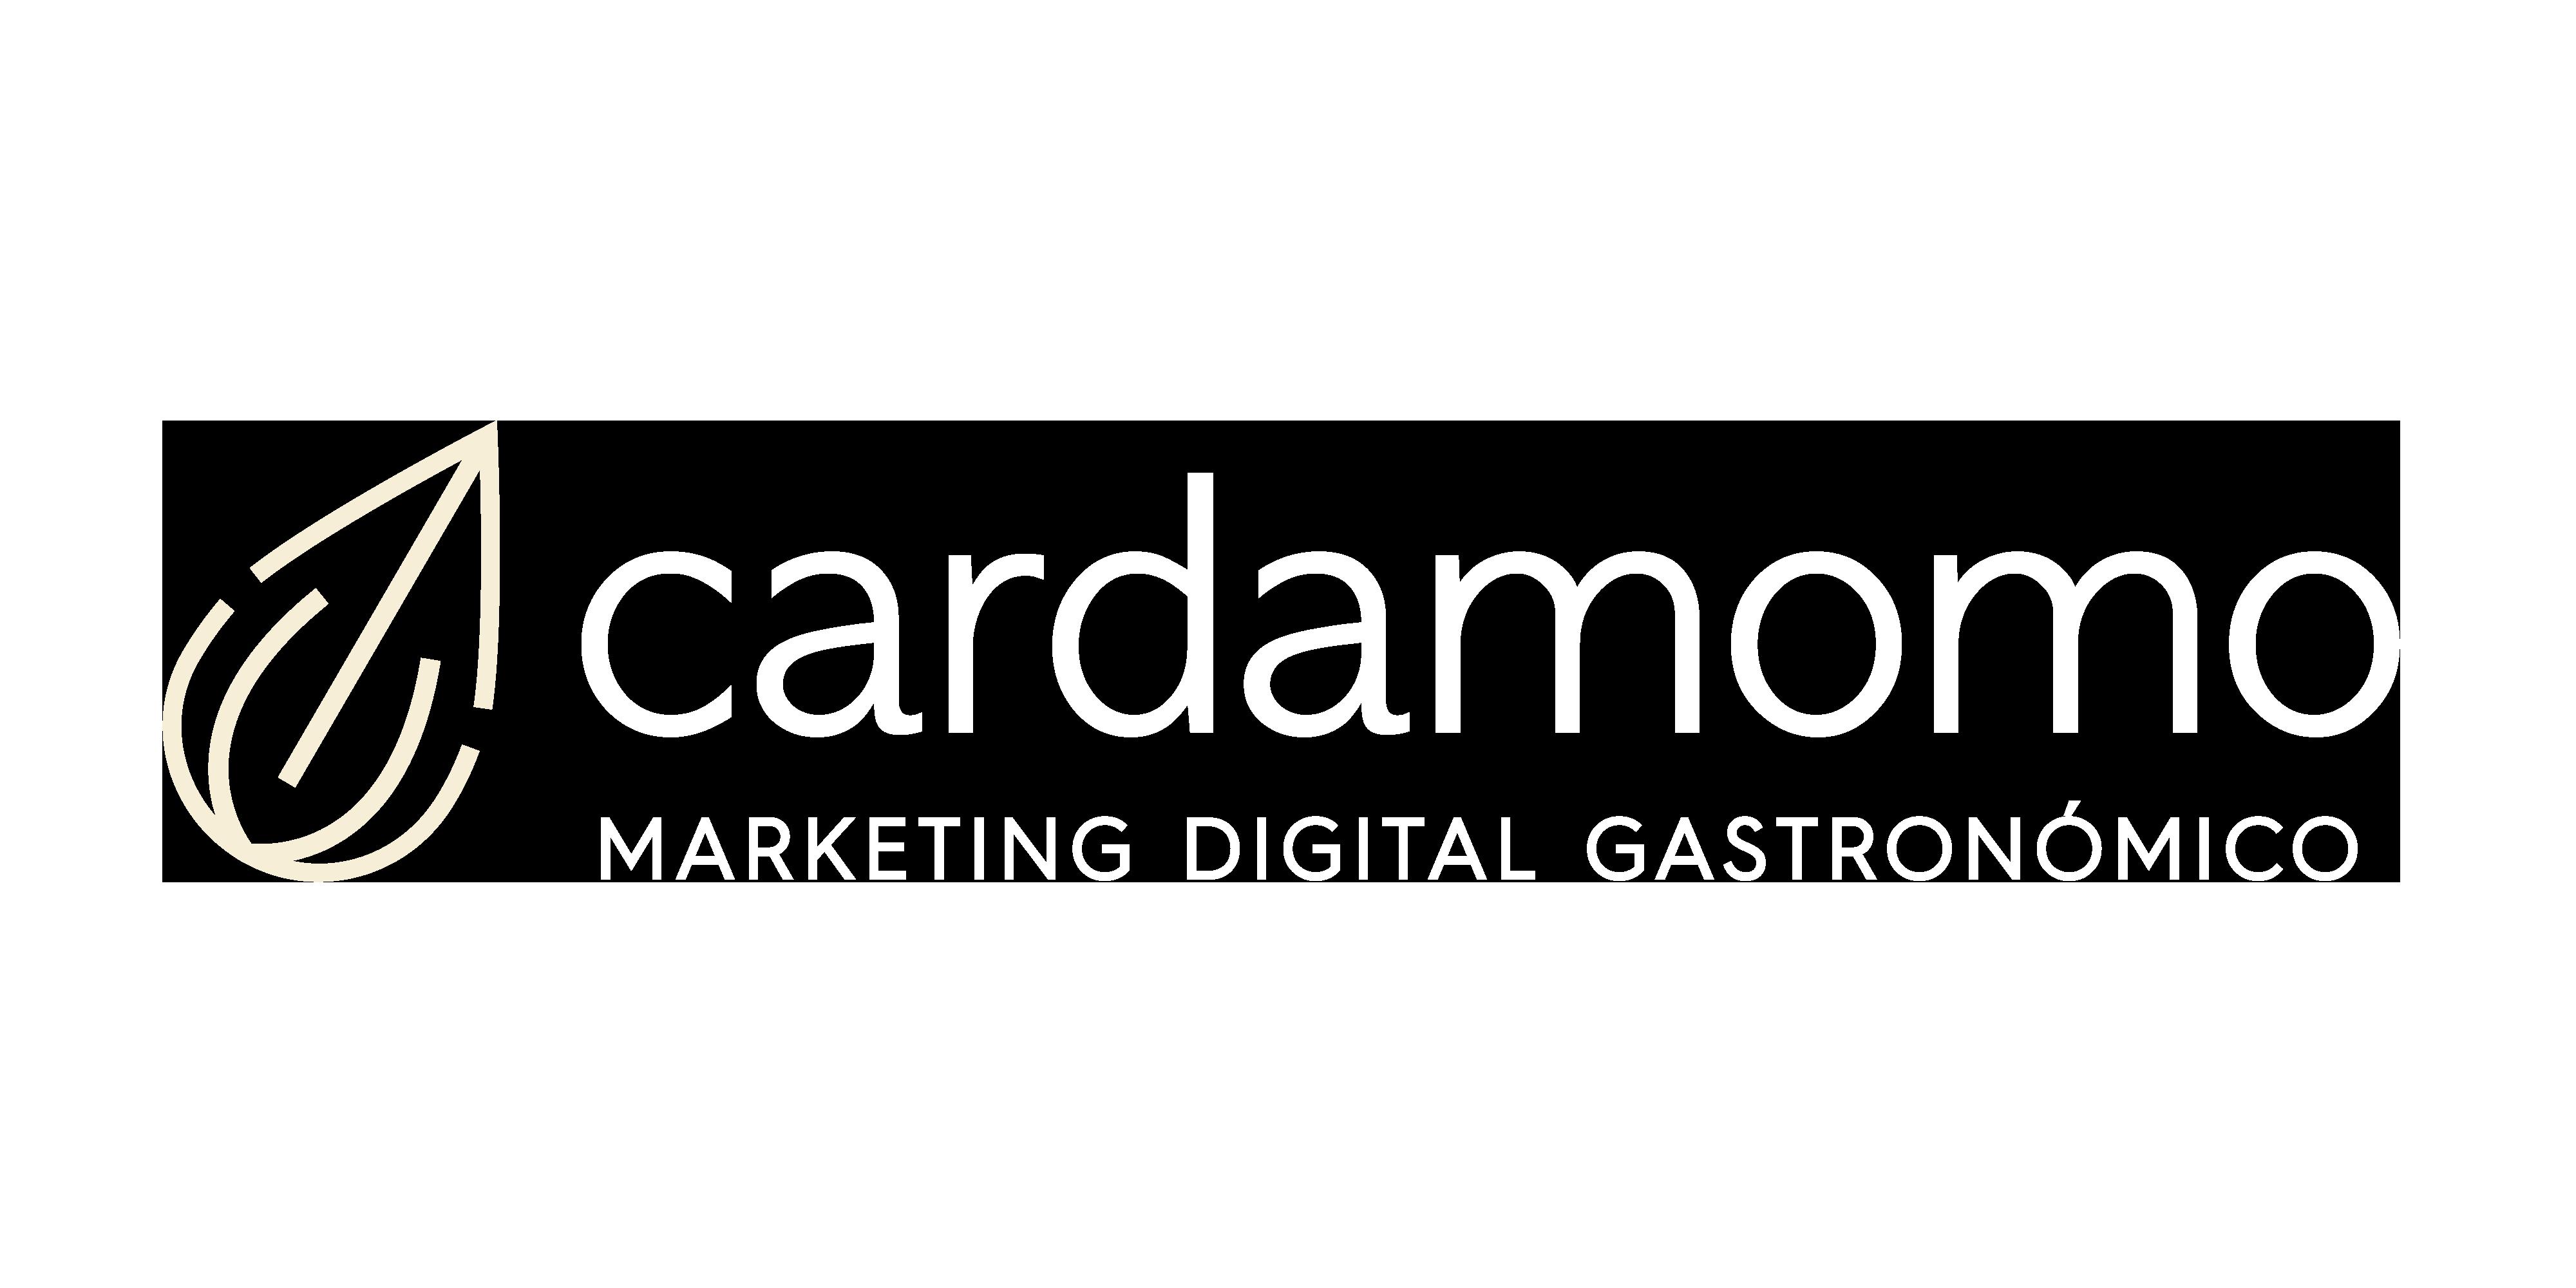 LogotipodeMarketingDigital_Gastronomico